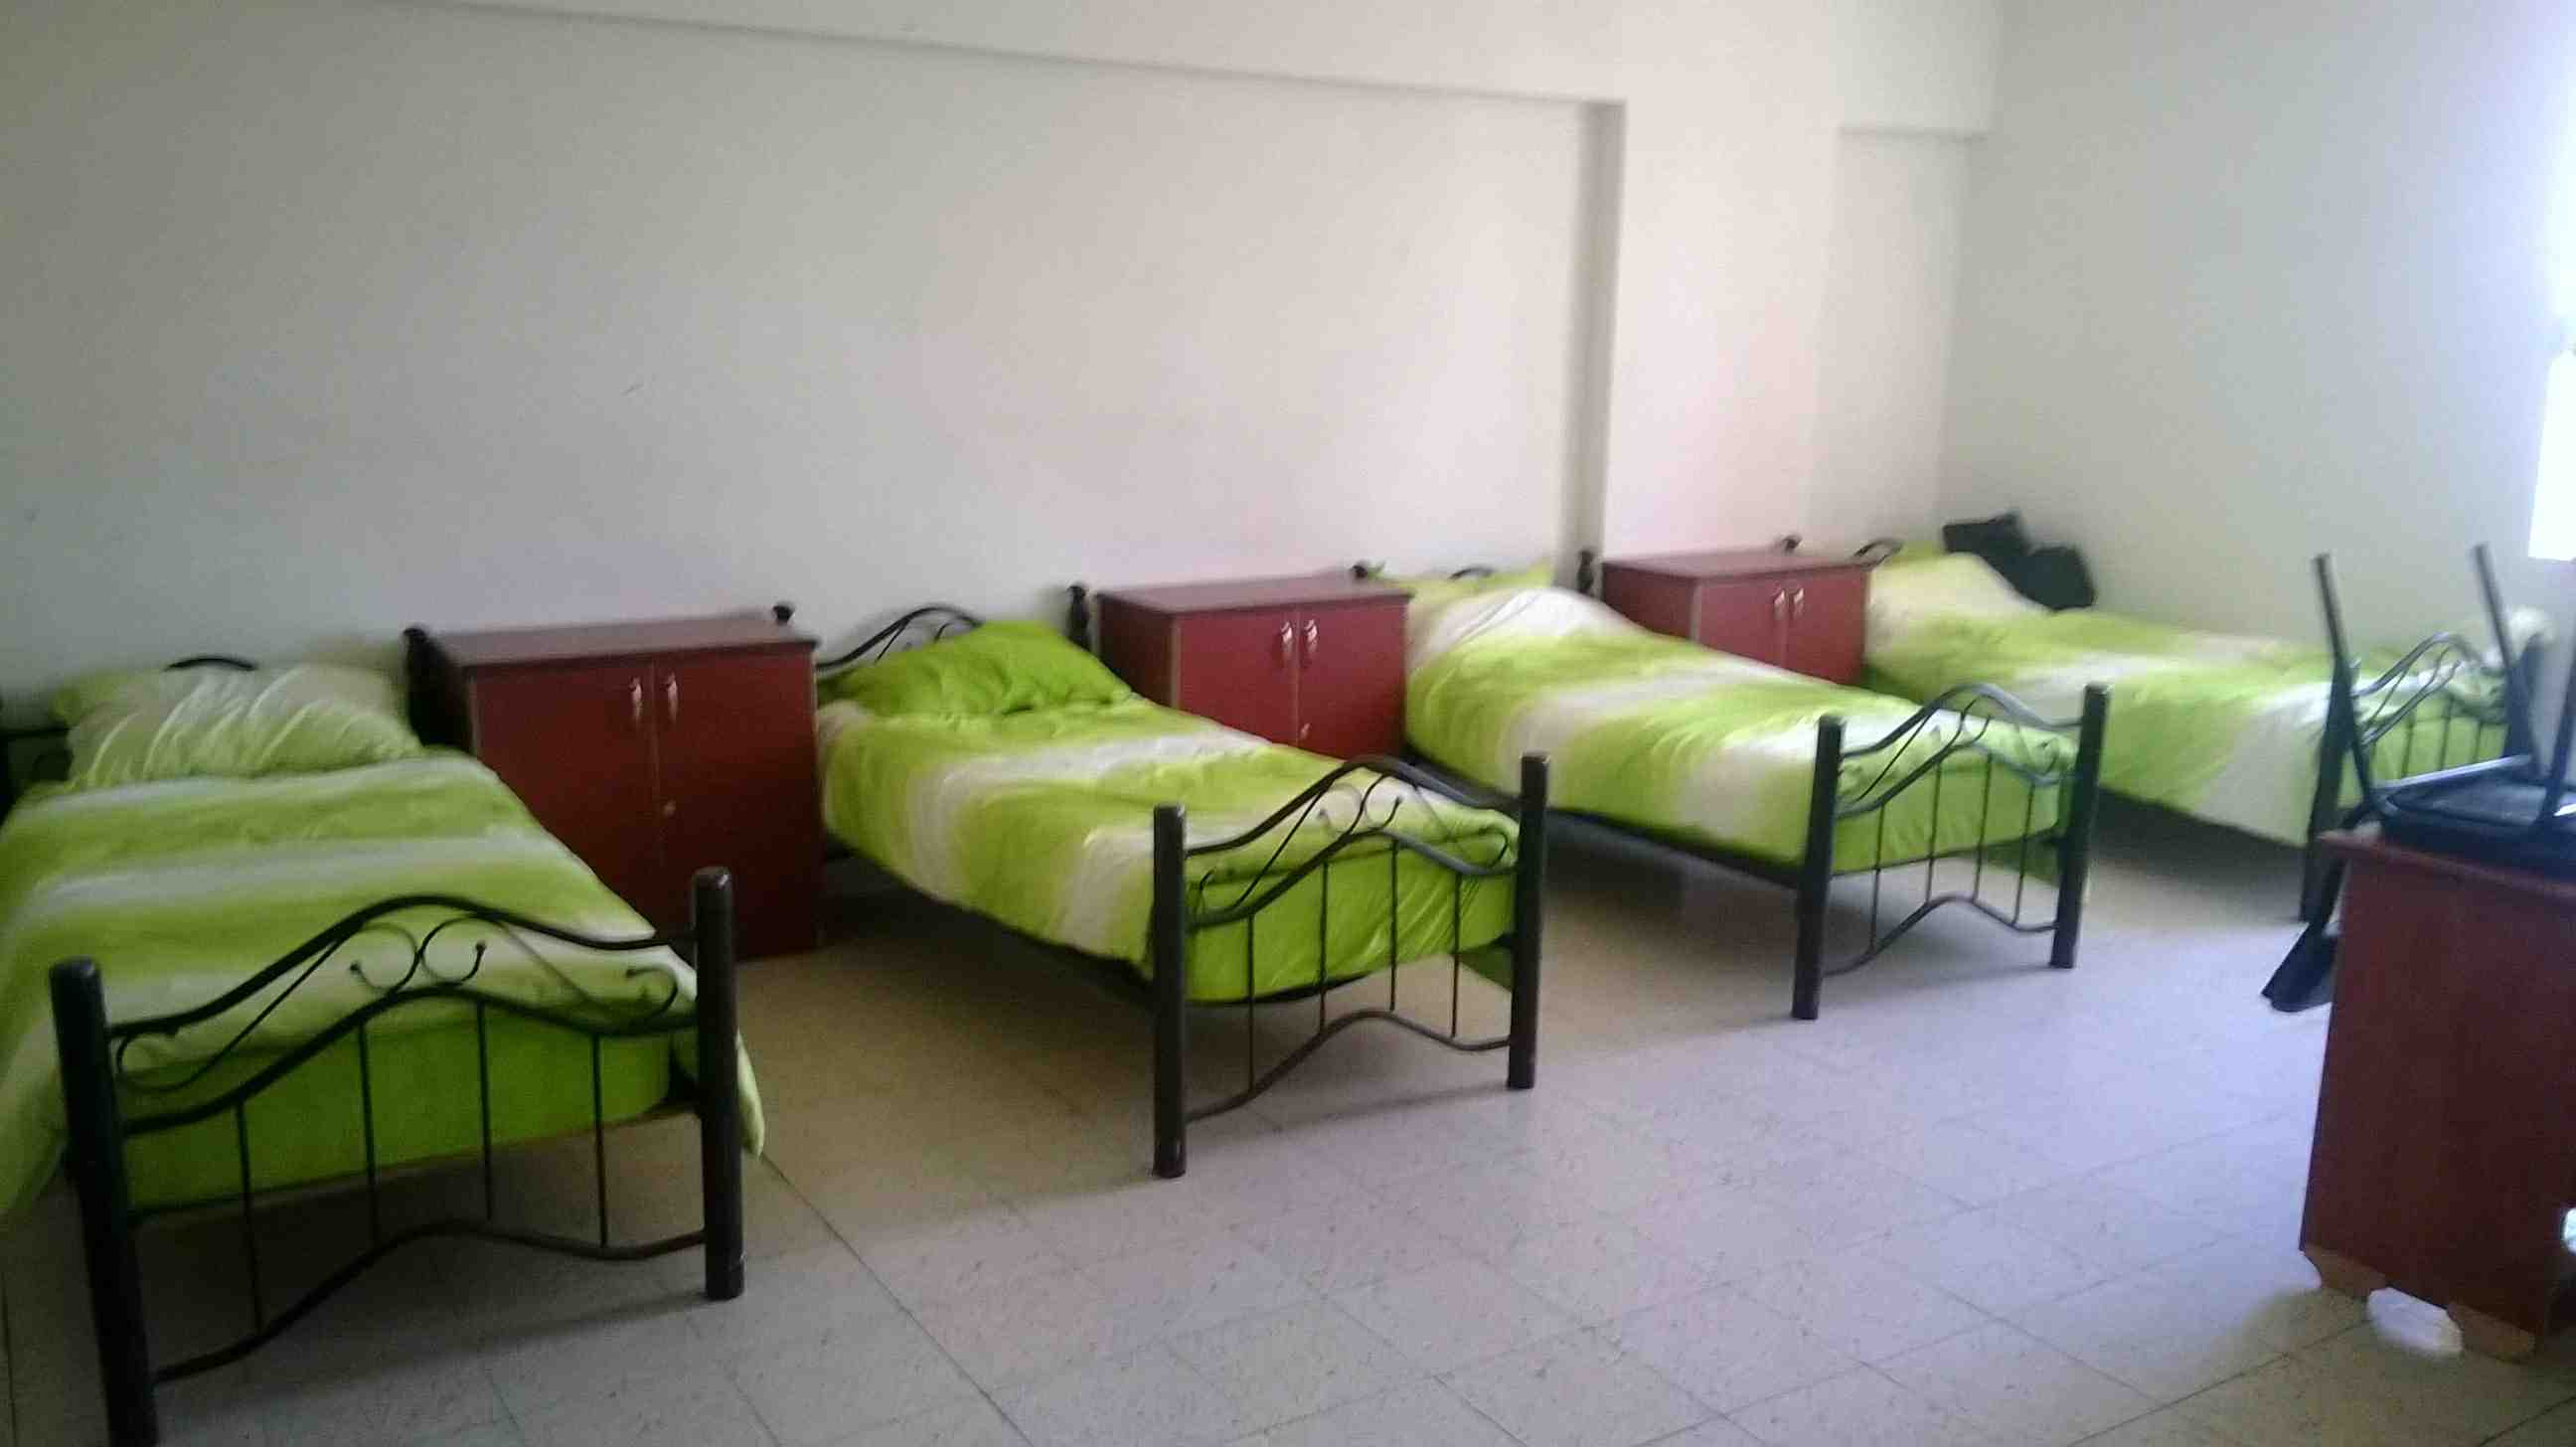 Students sleep places